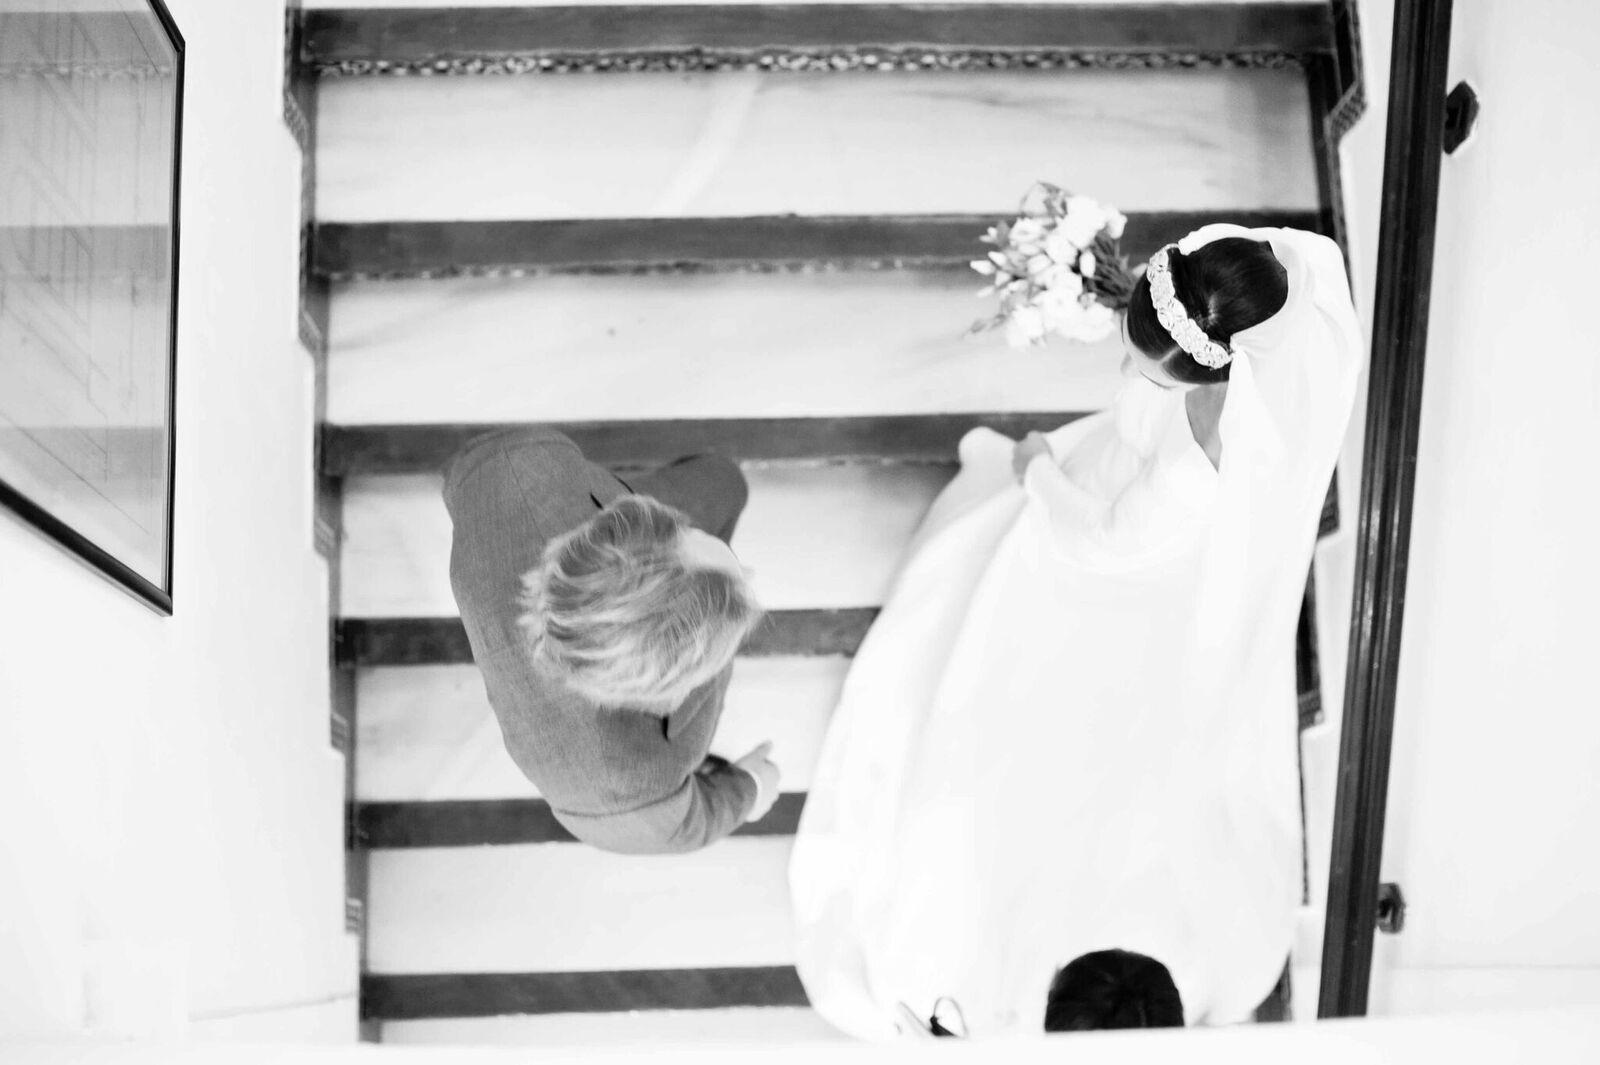 Si-Quiero-Wedding-Planner-Sira-Antequera-Patricia-Javier-012